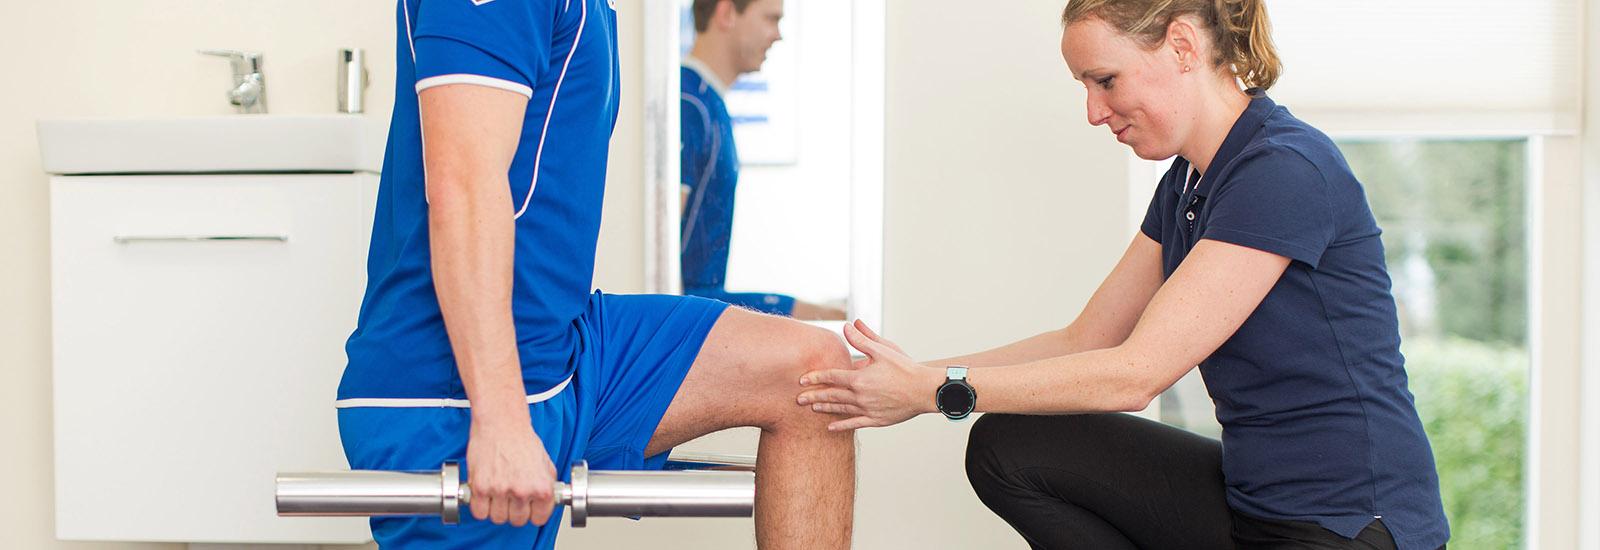 Sportfysiotherapie-Doetinchem